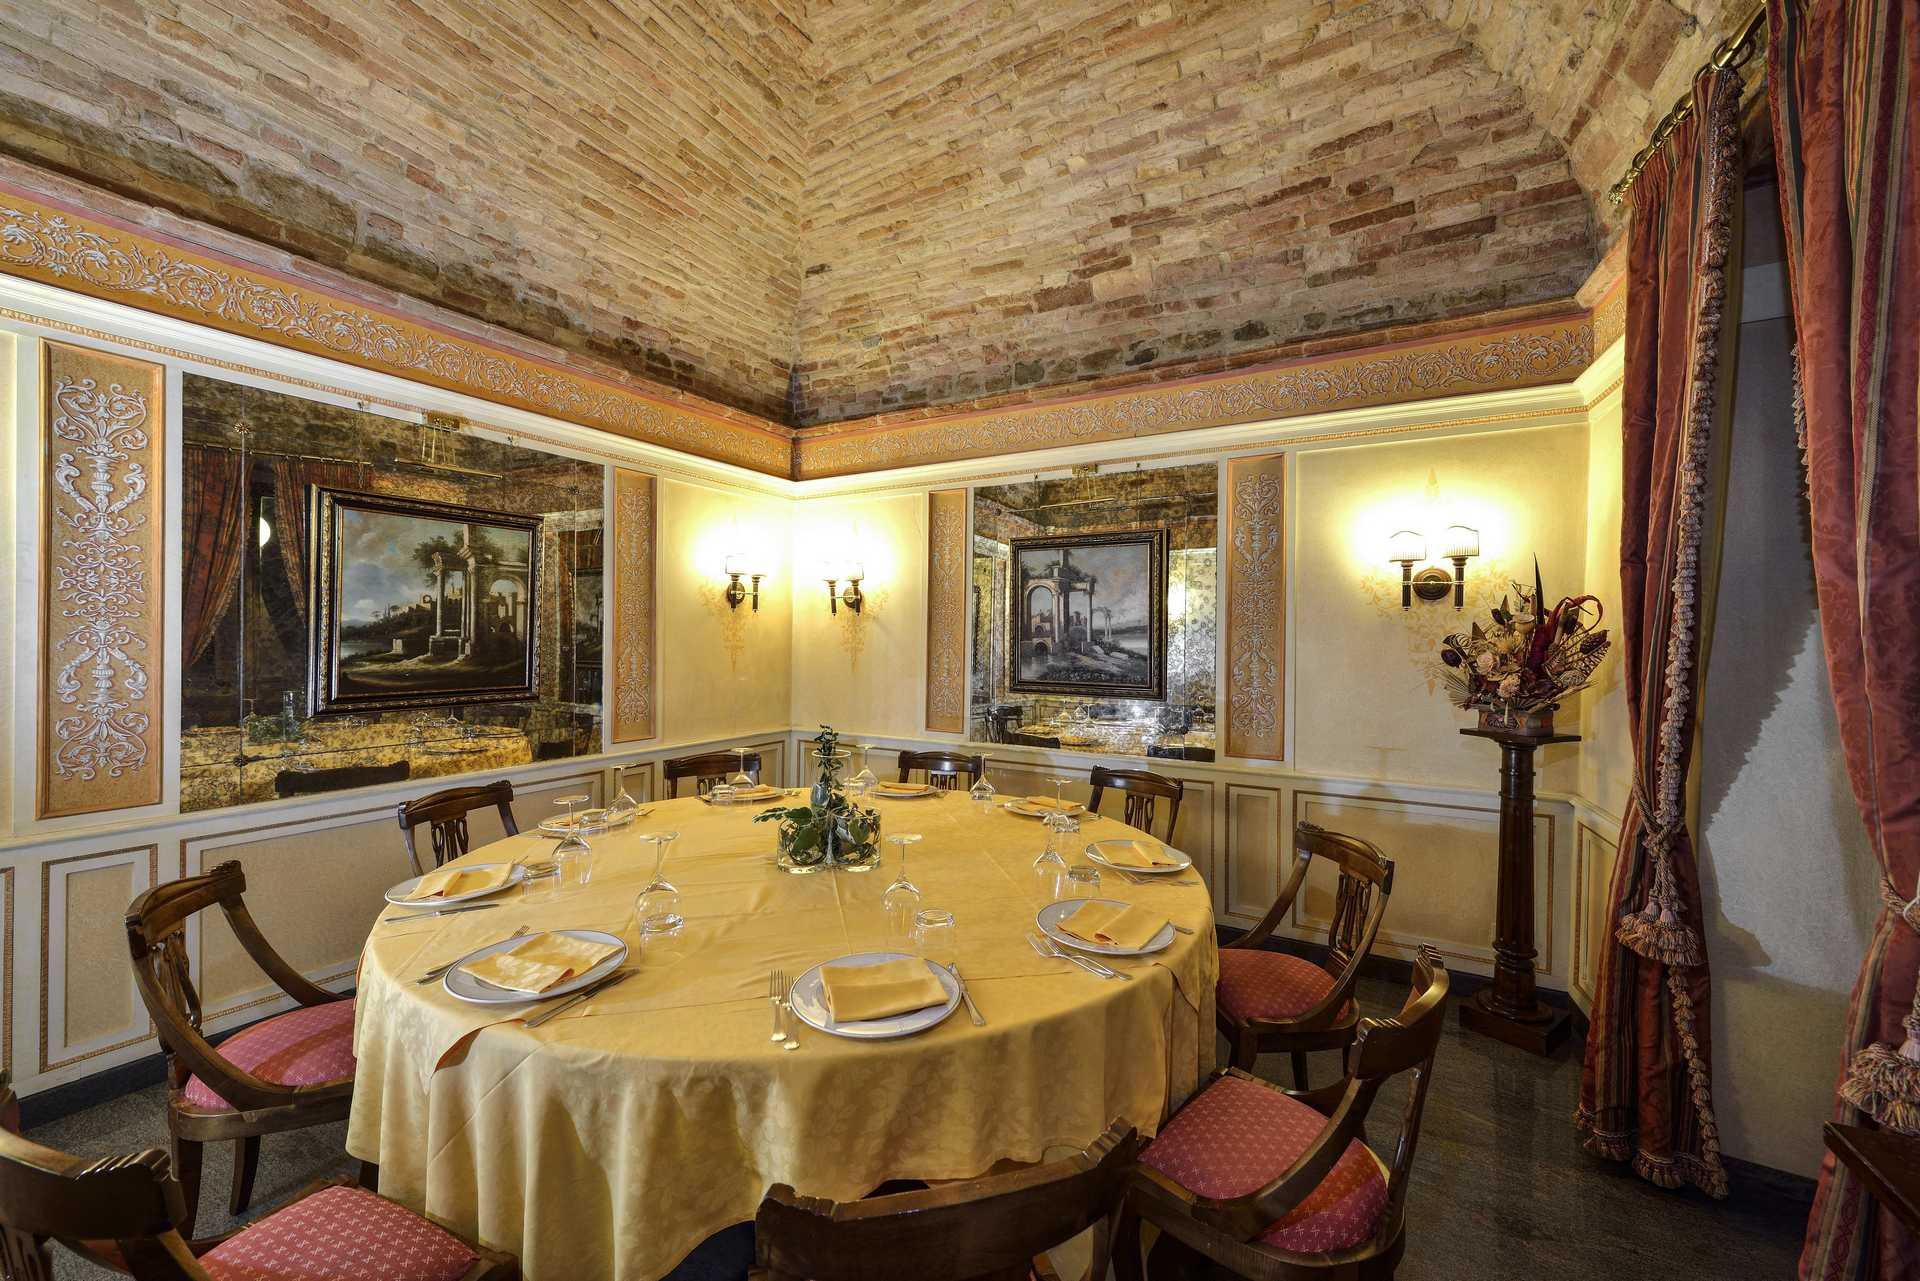 Hotel Fonte Cesia - dining- Ristorante Le Palme Sala Jacopo